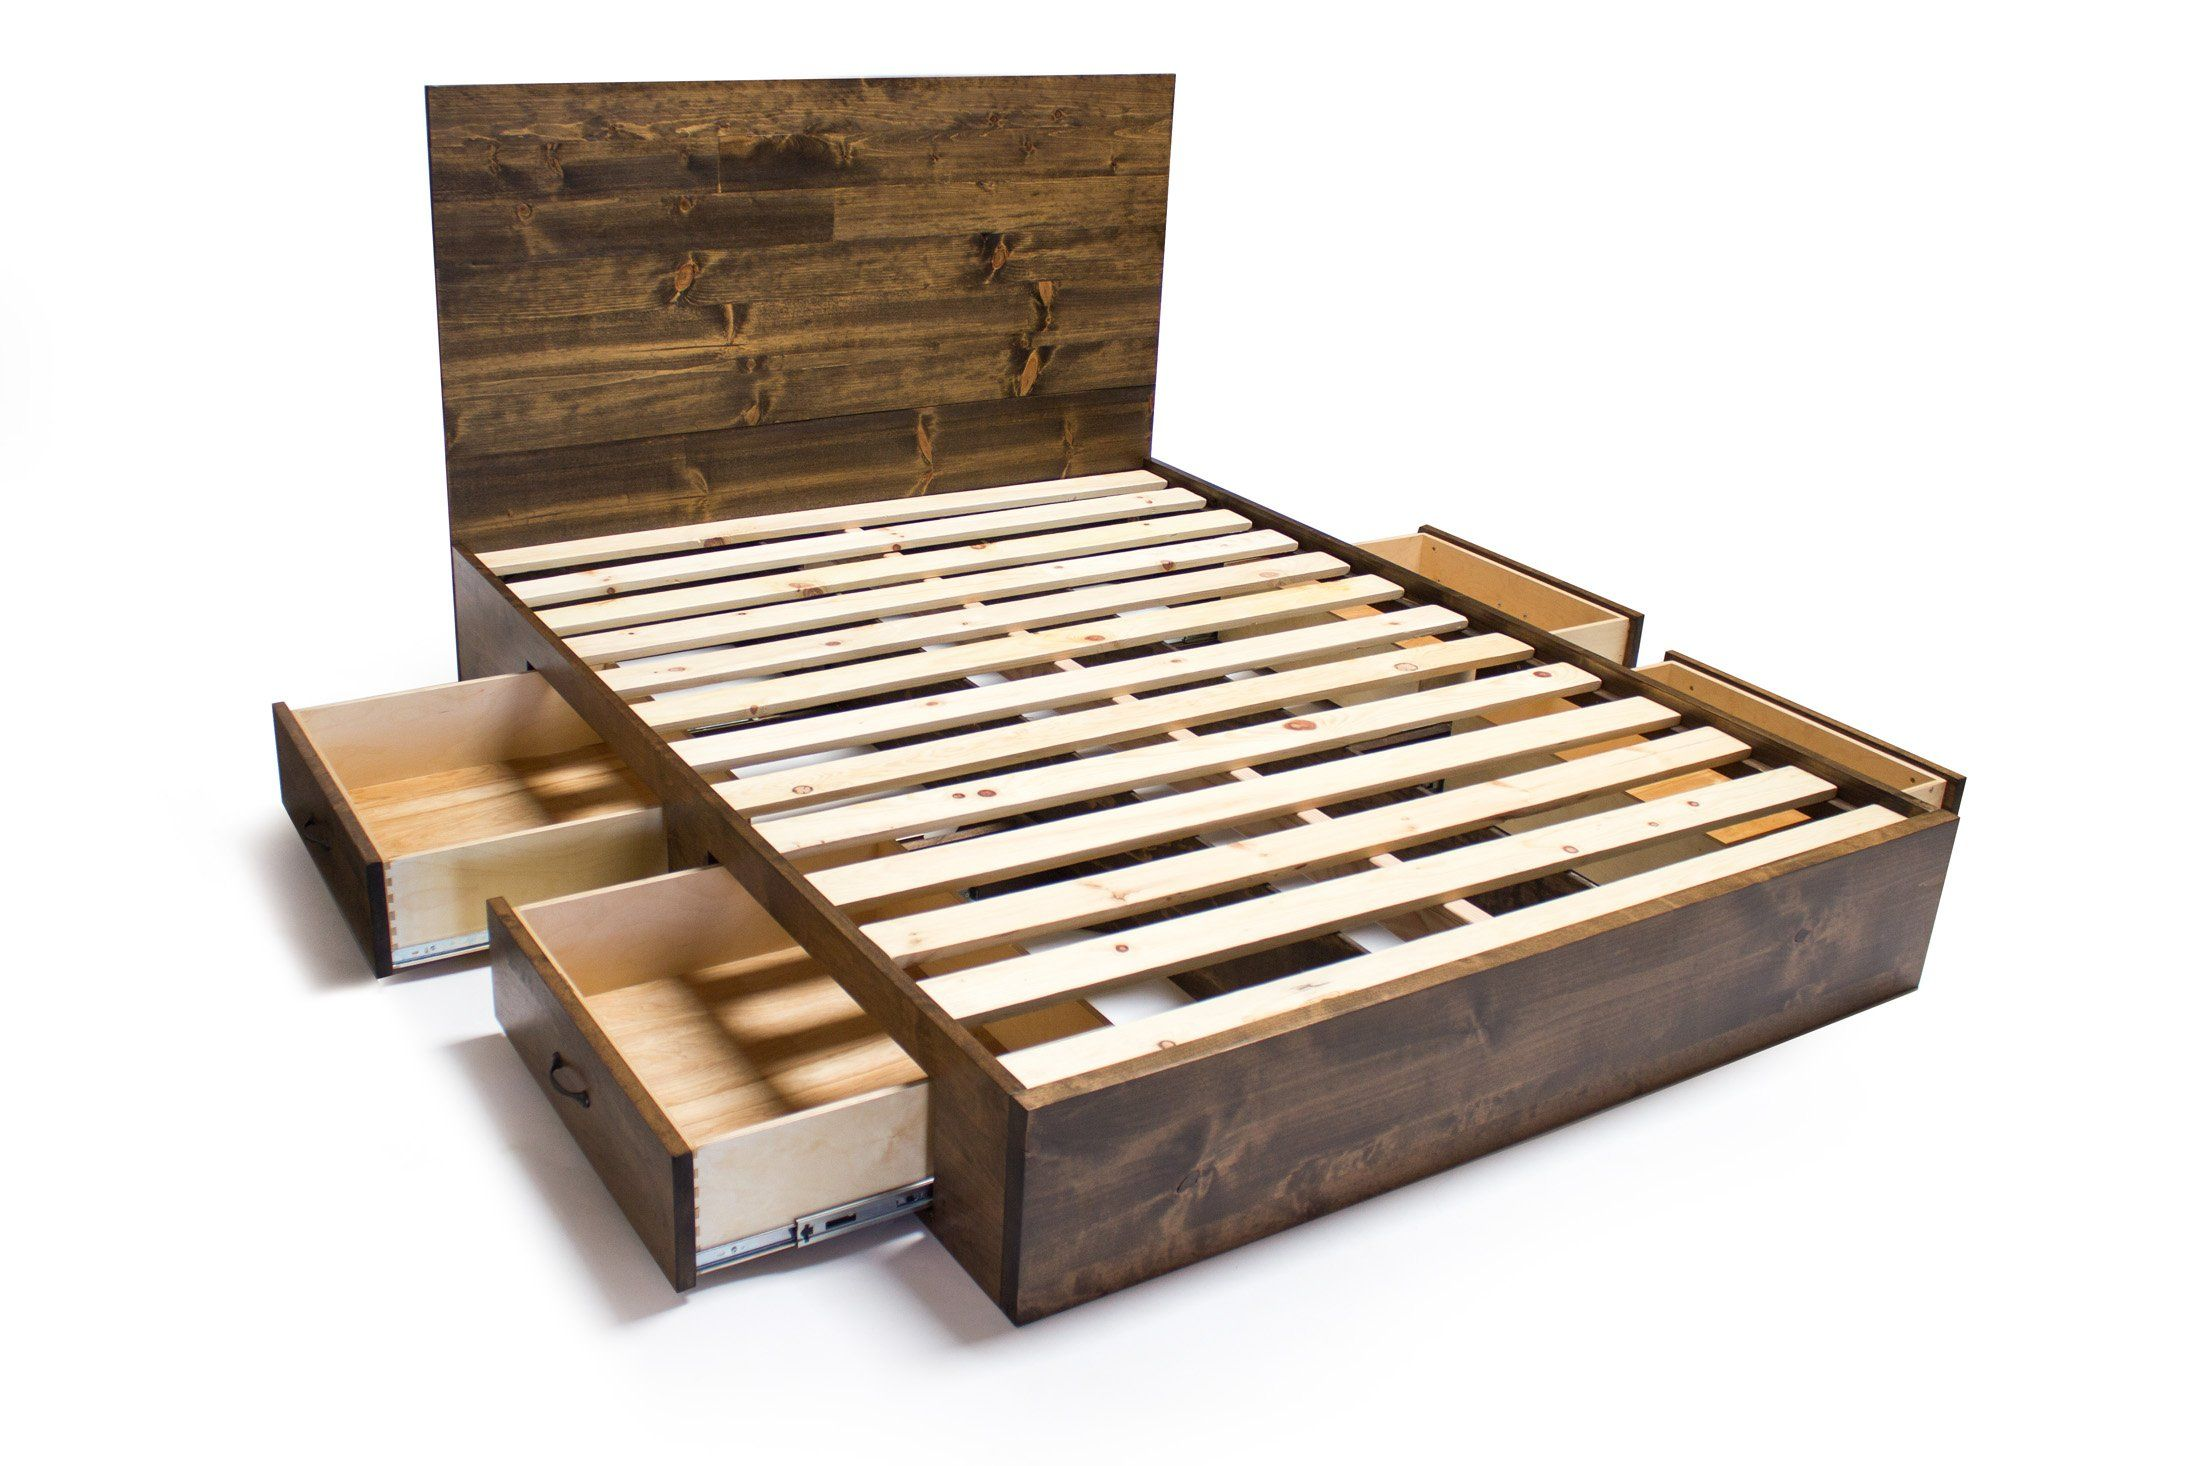 Wood Bed Frame Ideas - Camas - Pinterest - Frames